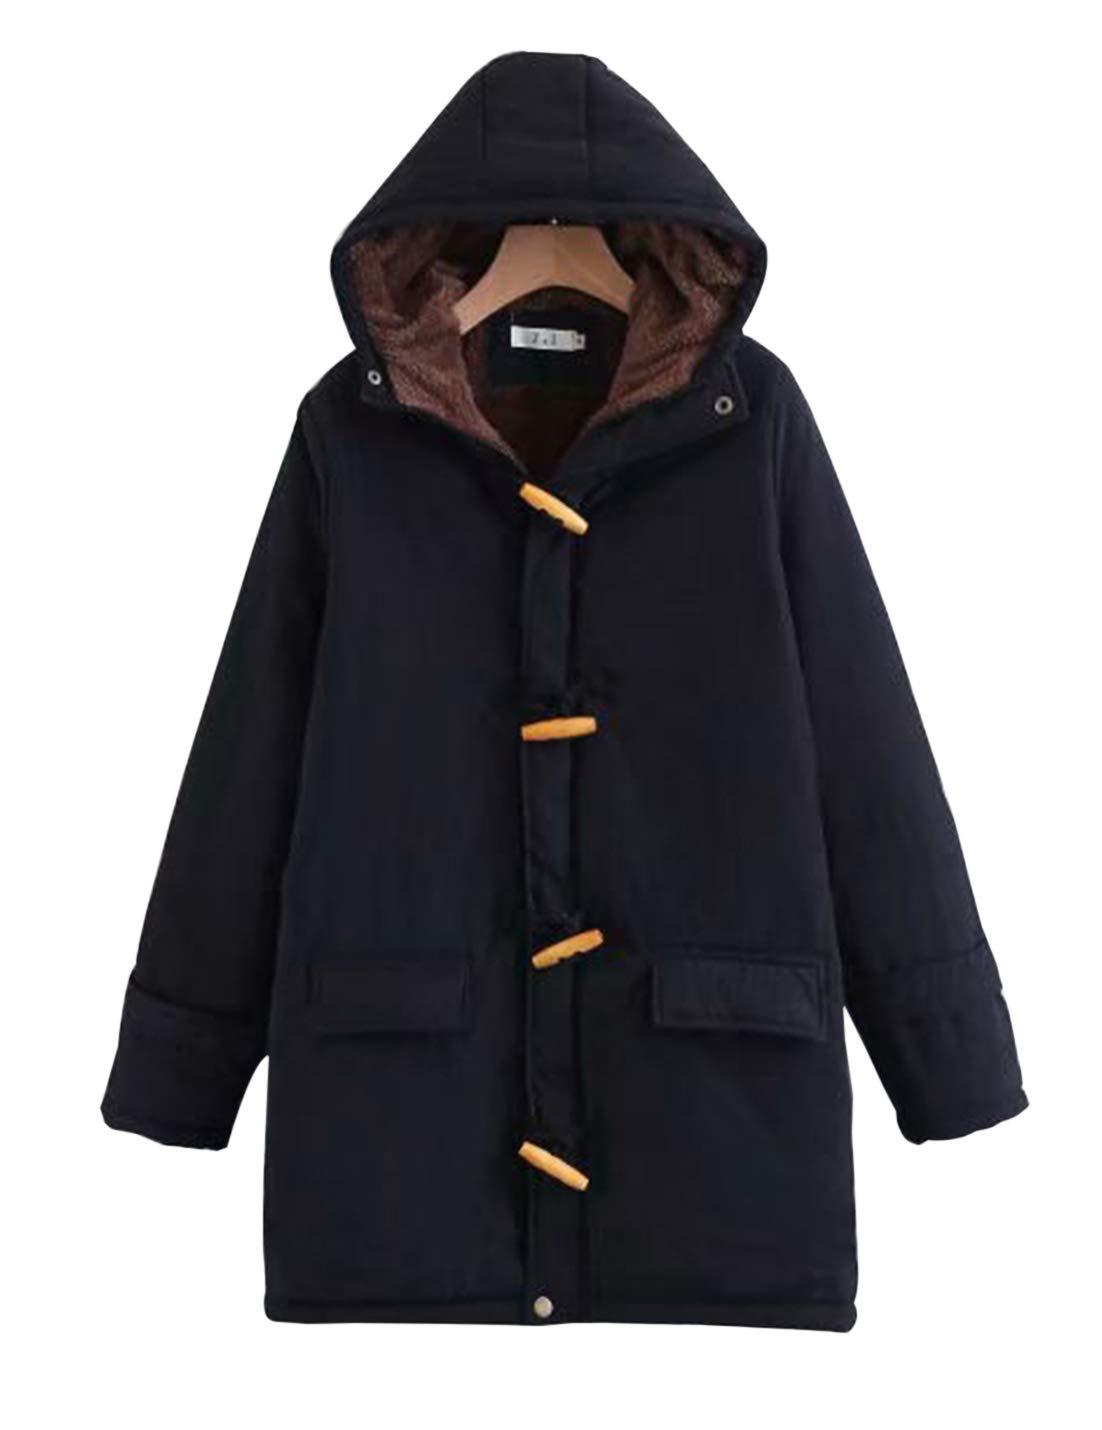 Gihuo Women's Casual Fleece-Lined Winter Warm Coat Hooded Jacket (Style#2 Black, X-Small)